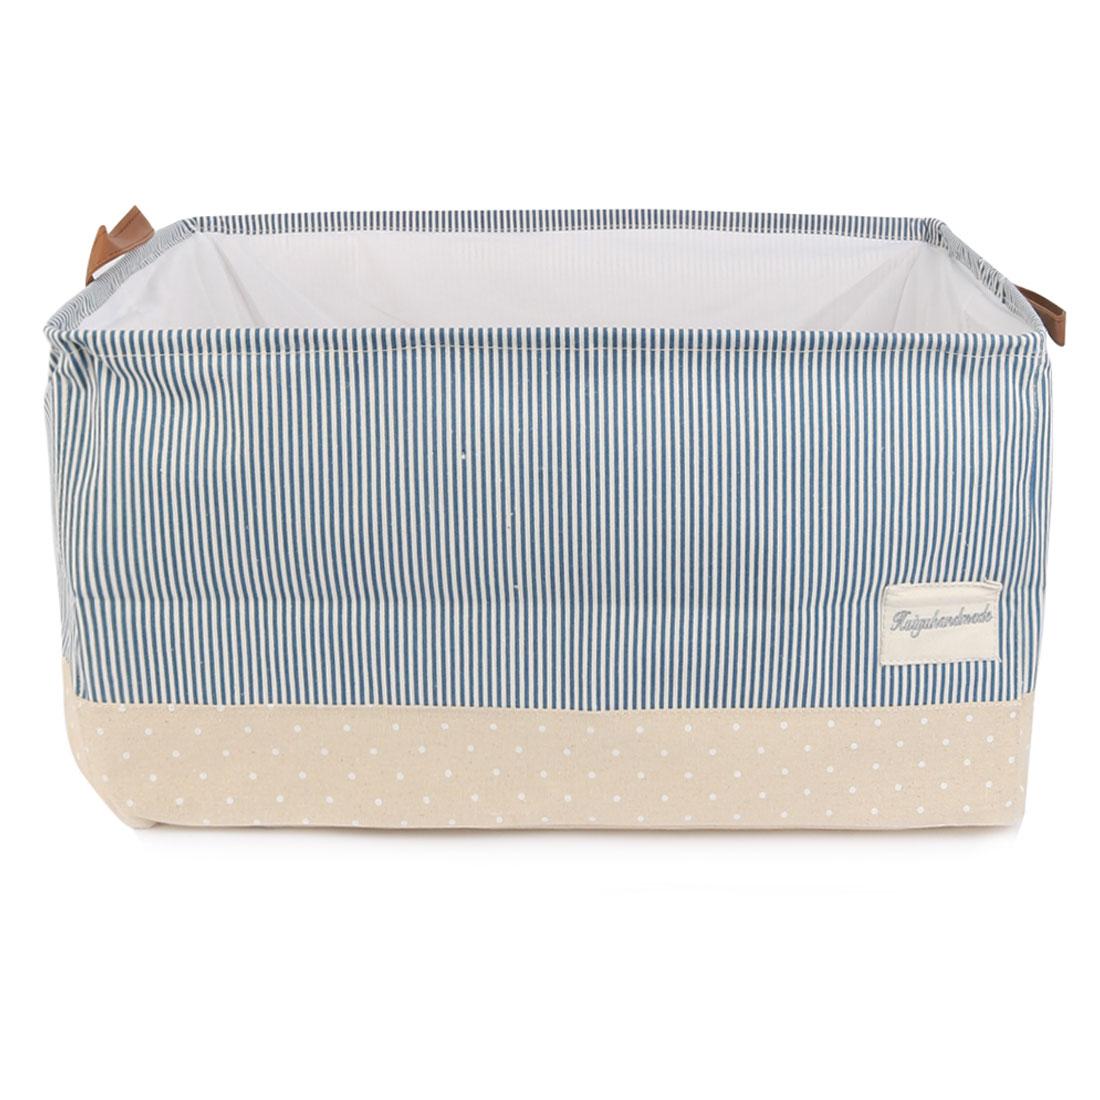 Collapsible Storage Bin Basket Clothes Box w Drawstring Closure (Stripe Pattern)